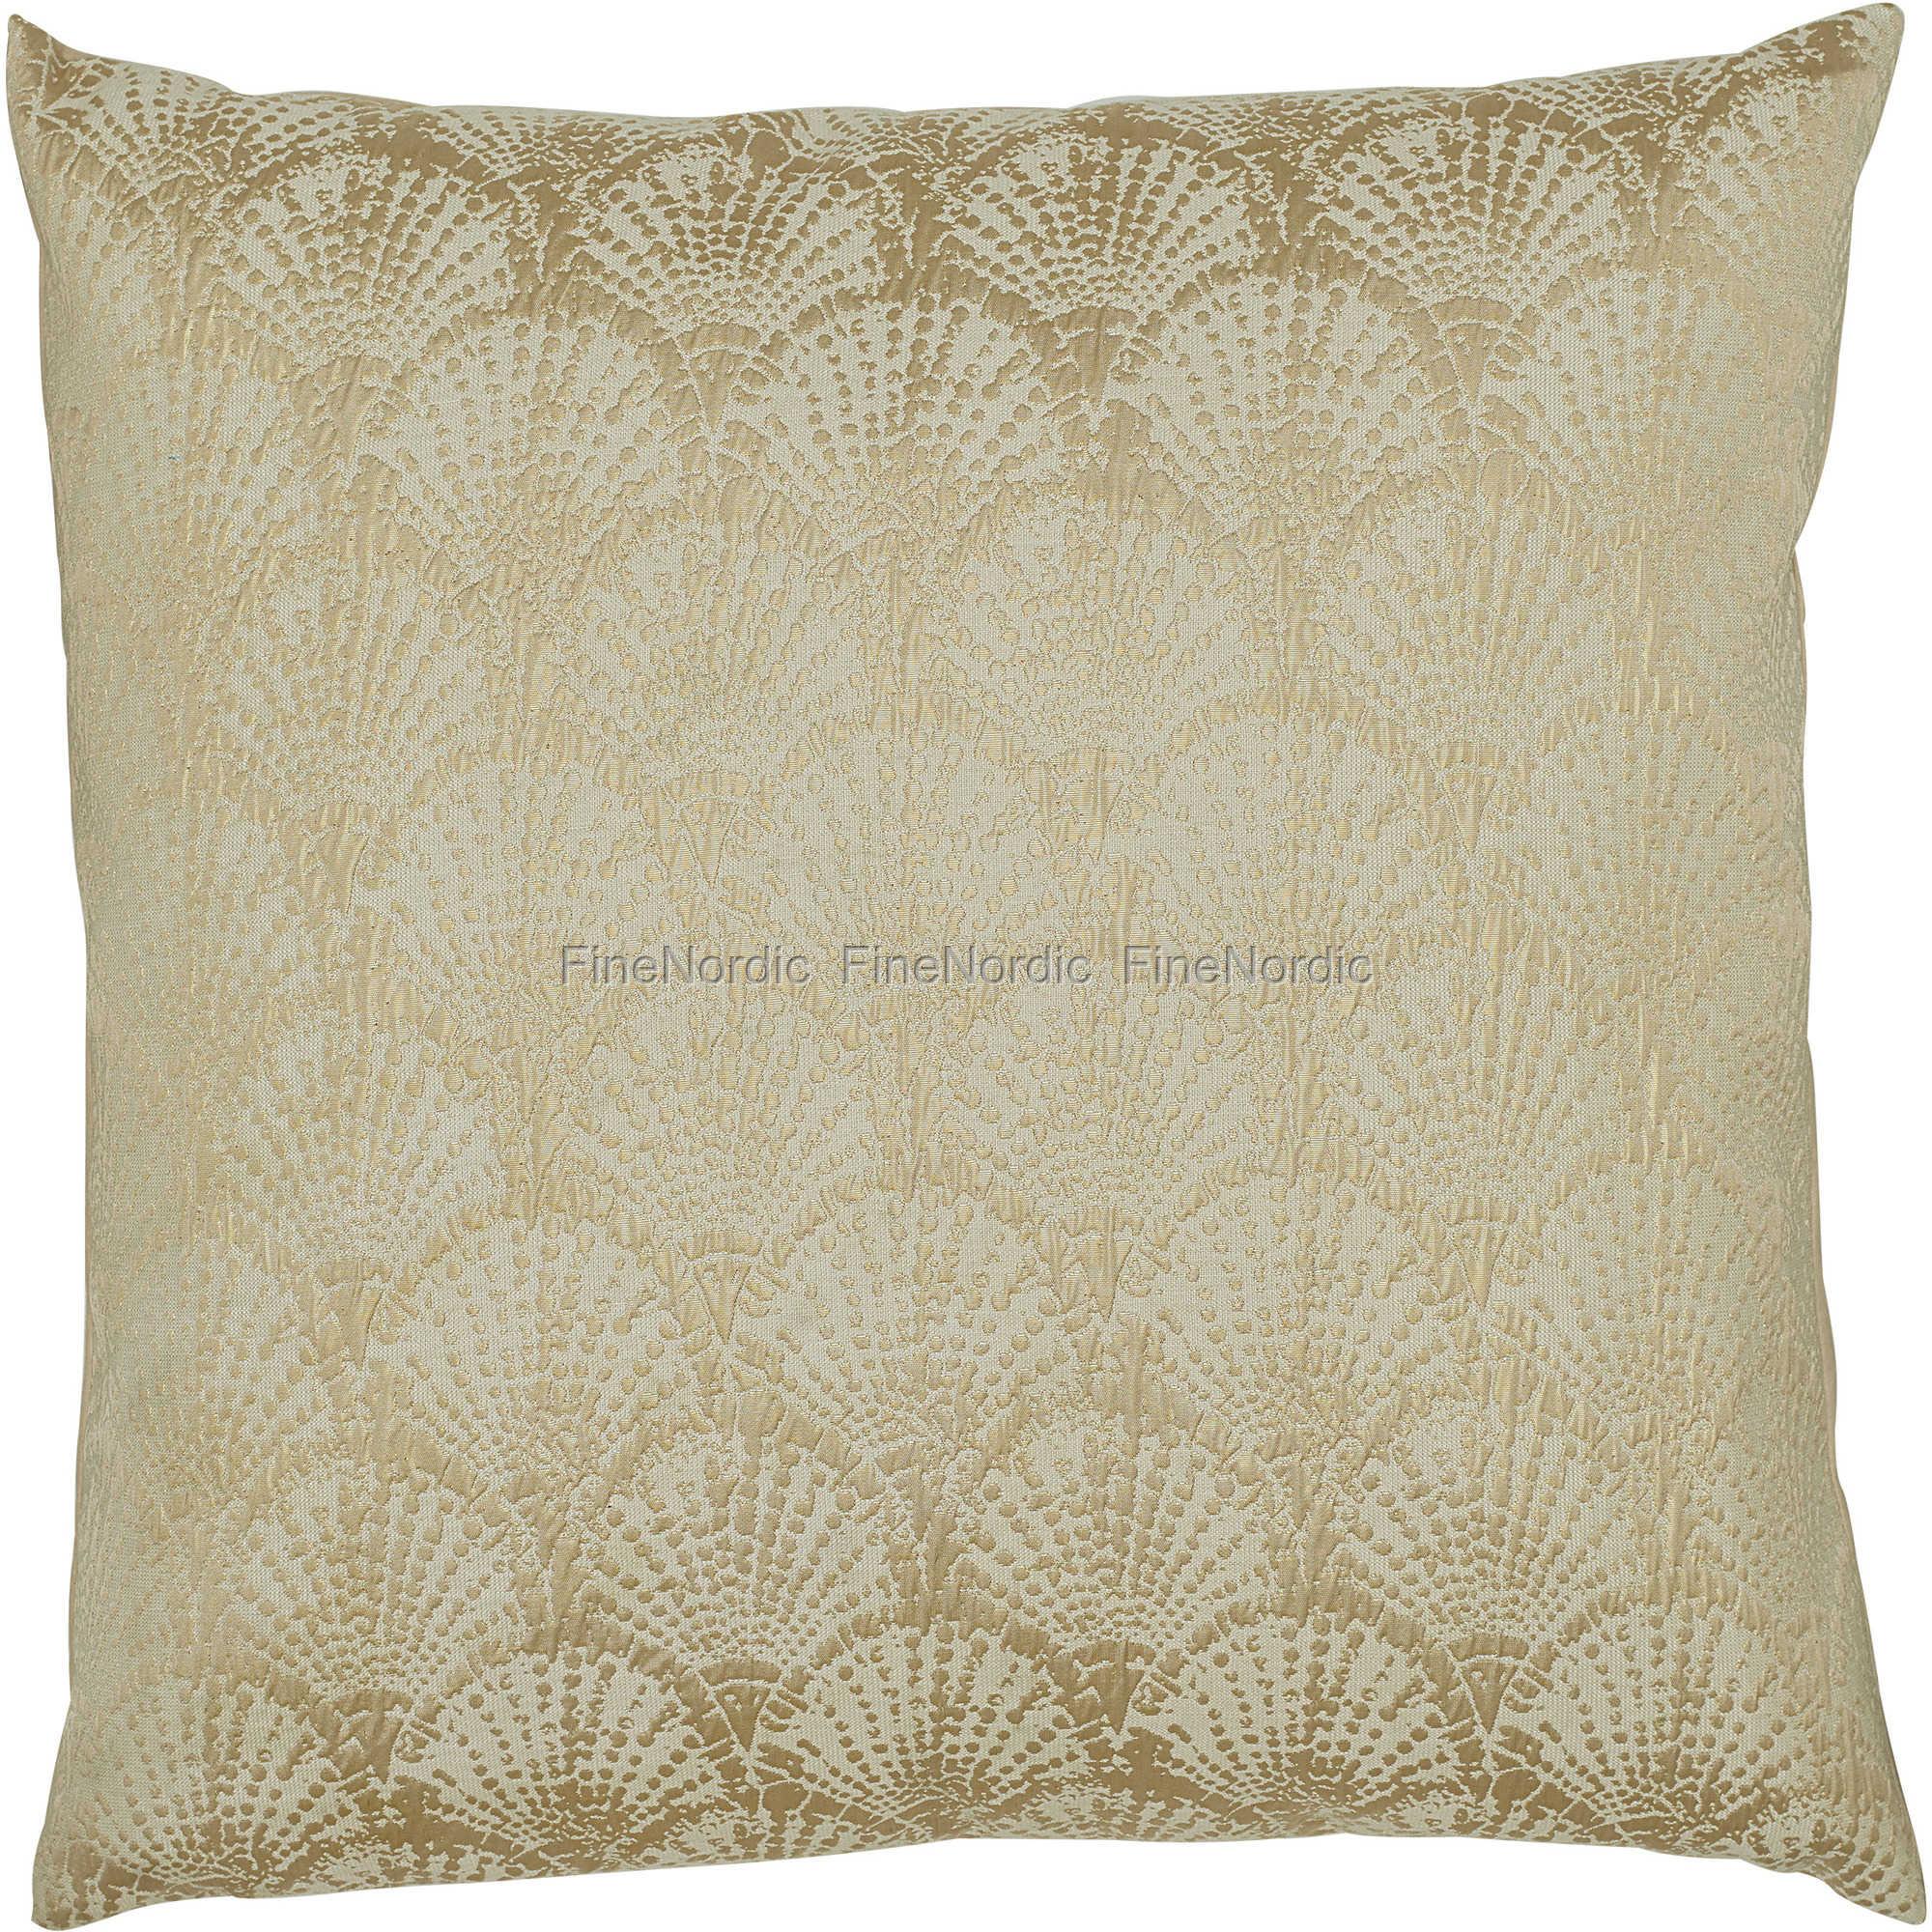 greengate gatenoir kissenh lle cushion art deco gold with white 50 x 50 cm. Black Bedroom Furniture Sets. Home Design Ideas